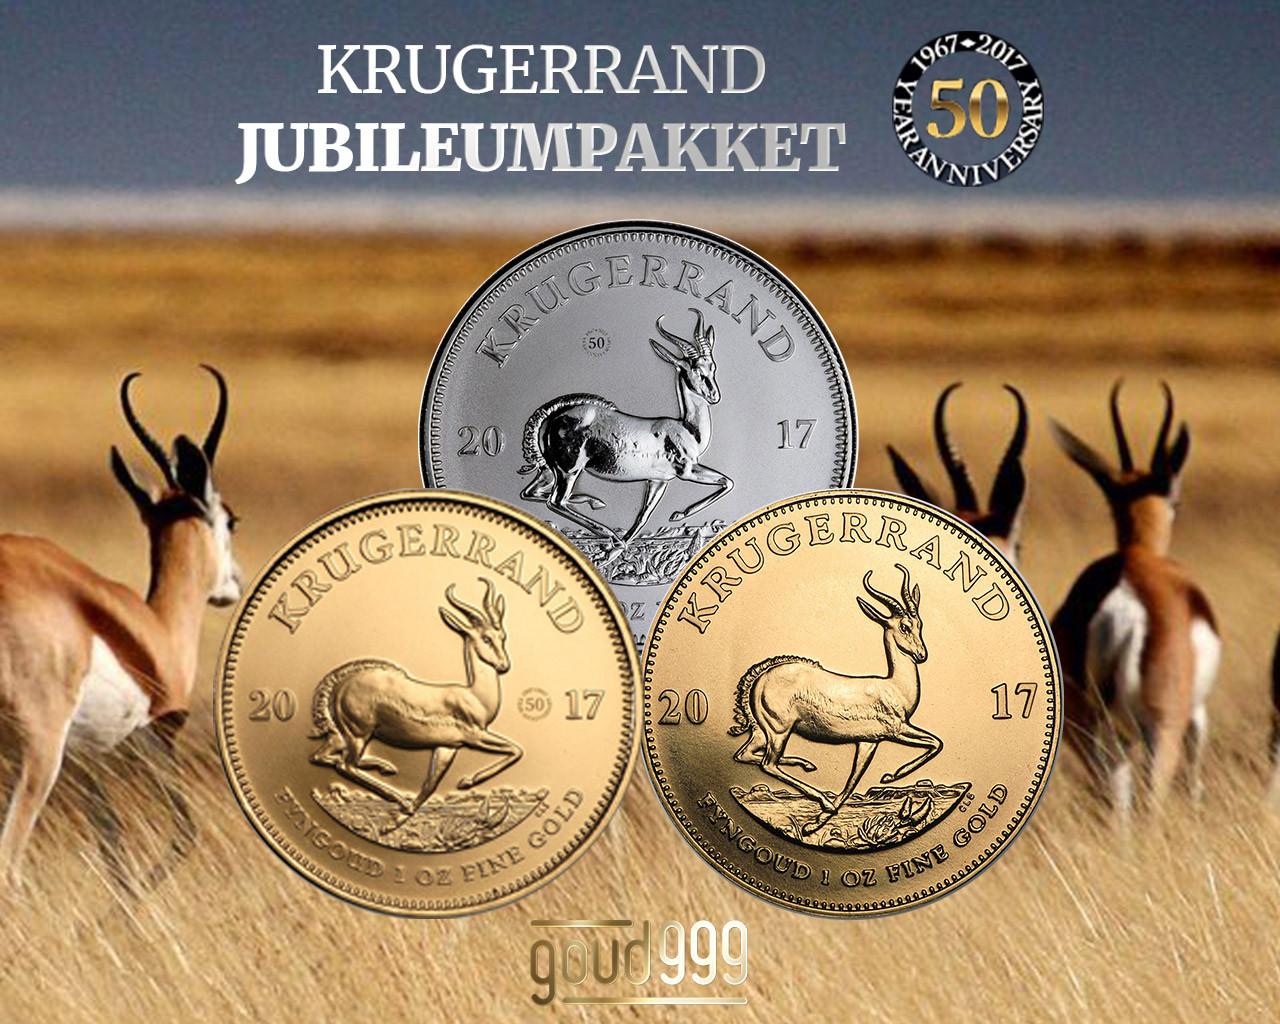 Krugerrand jubileumpakket | goud999